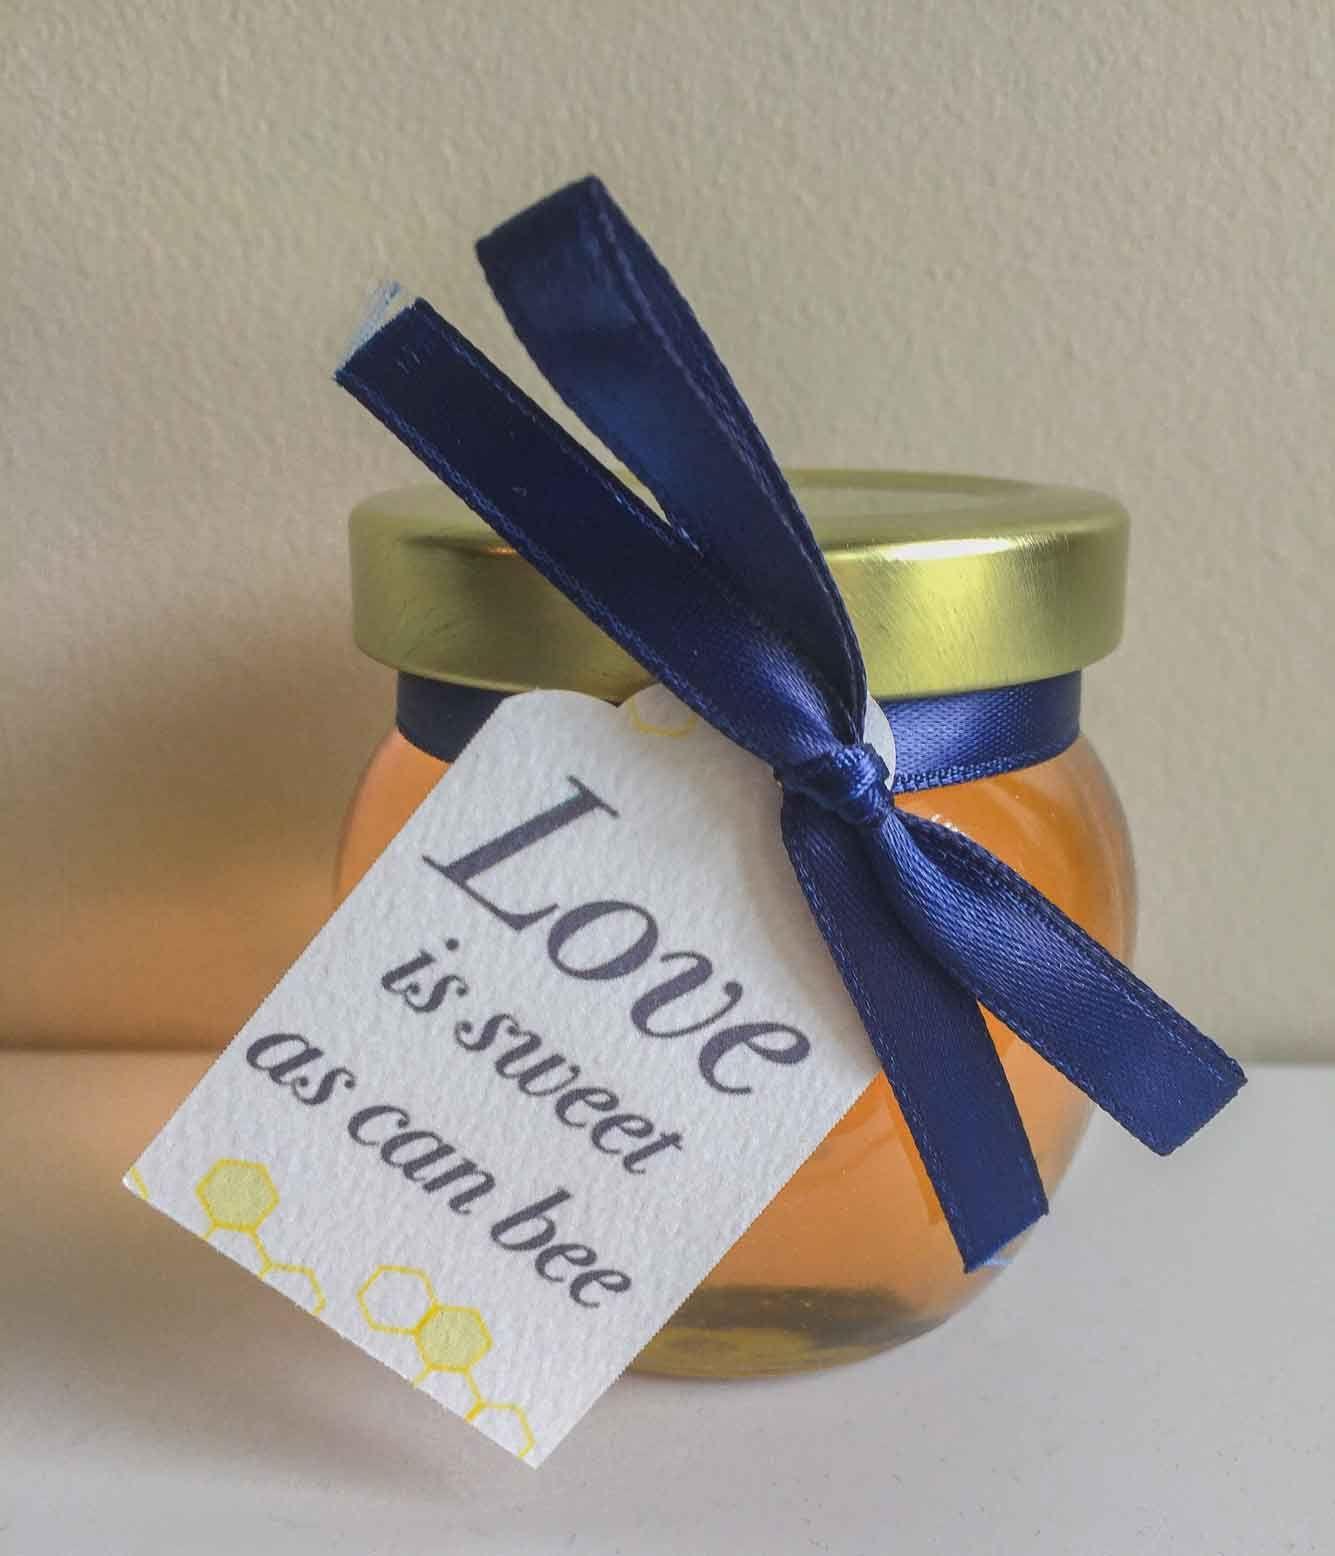 Honey Wedding Favors Diy Ideas That Are Inspired Honey Wedding Favors Honey Wedding Honey Jar Wedding Favors